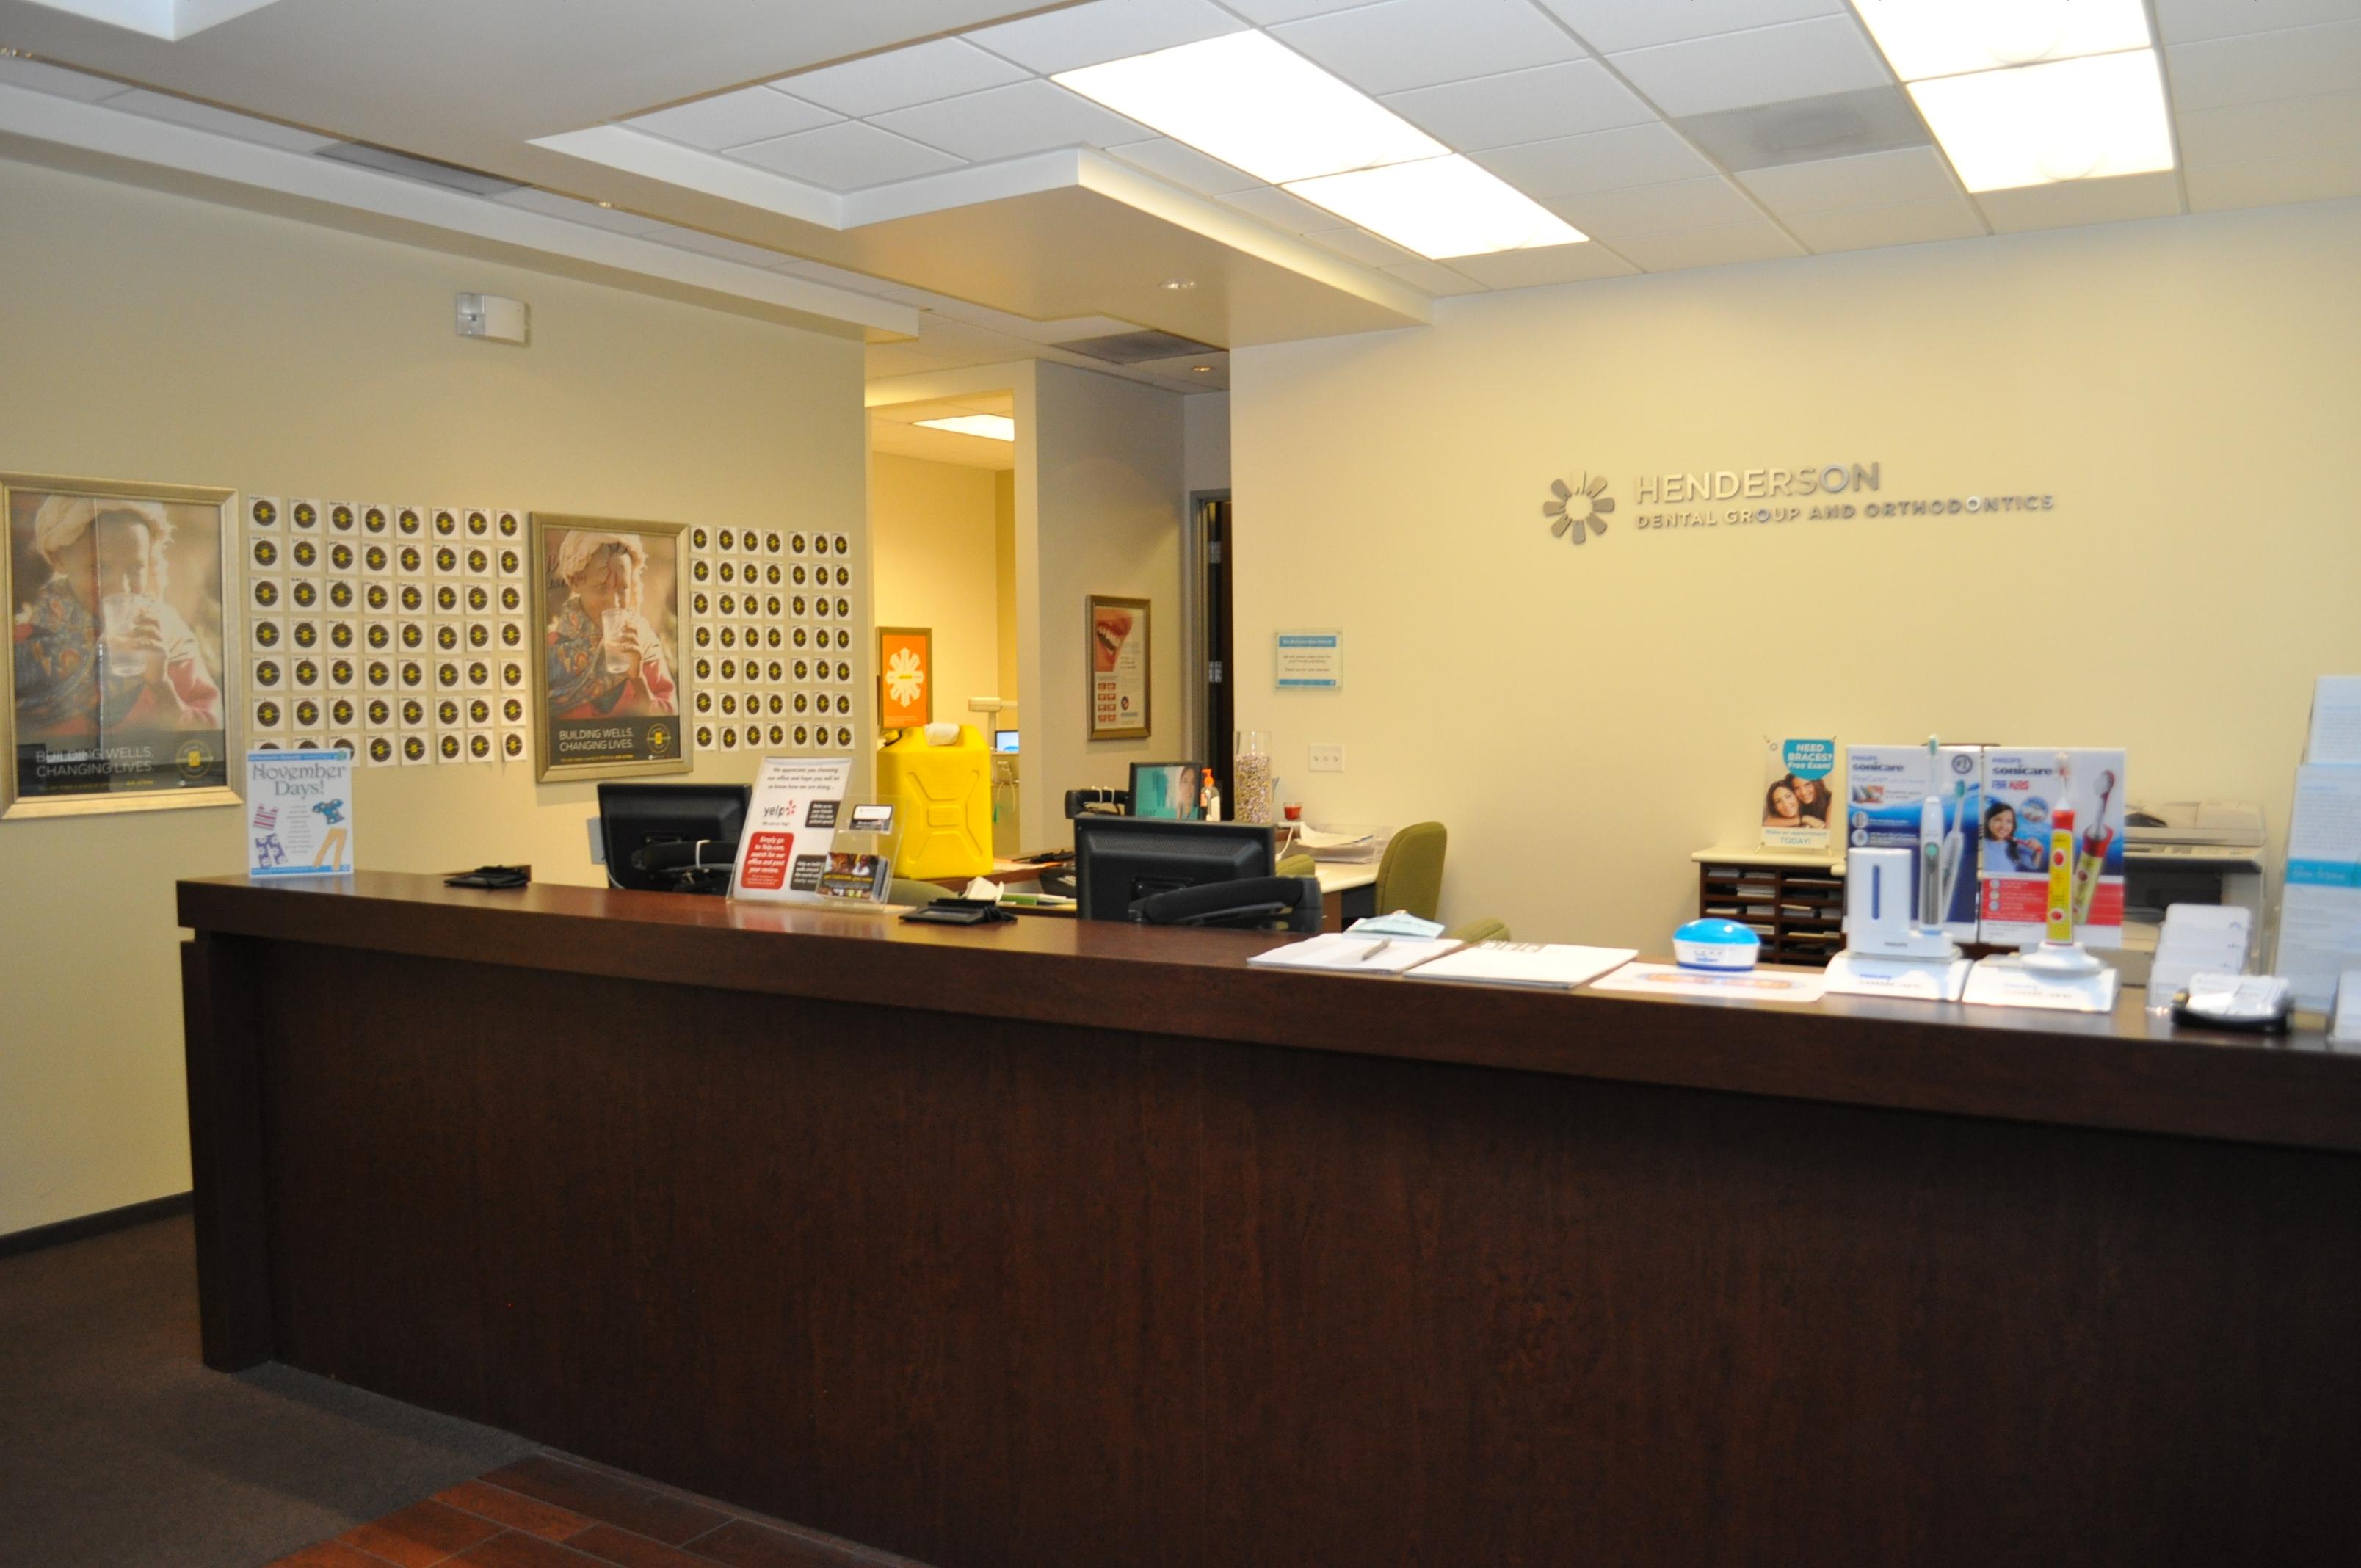 Henderson Dental Group and Orthodontics image 1